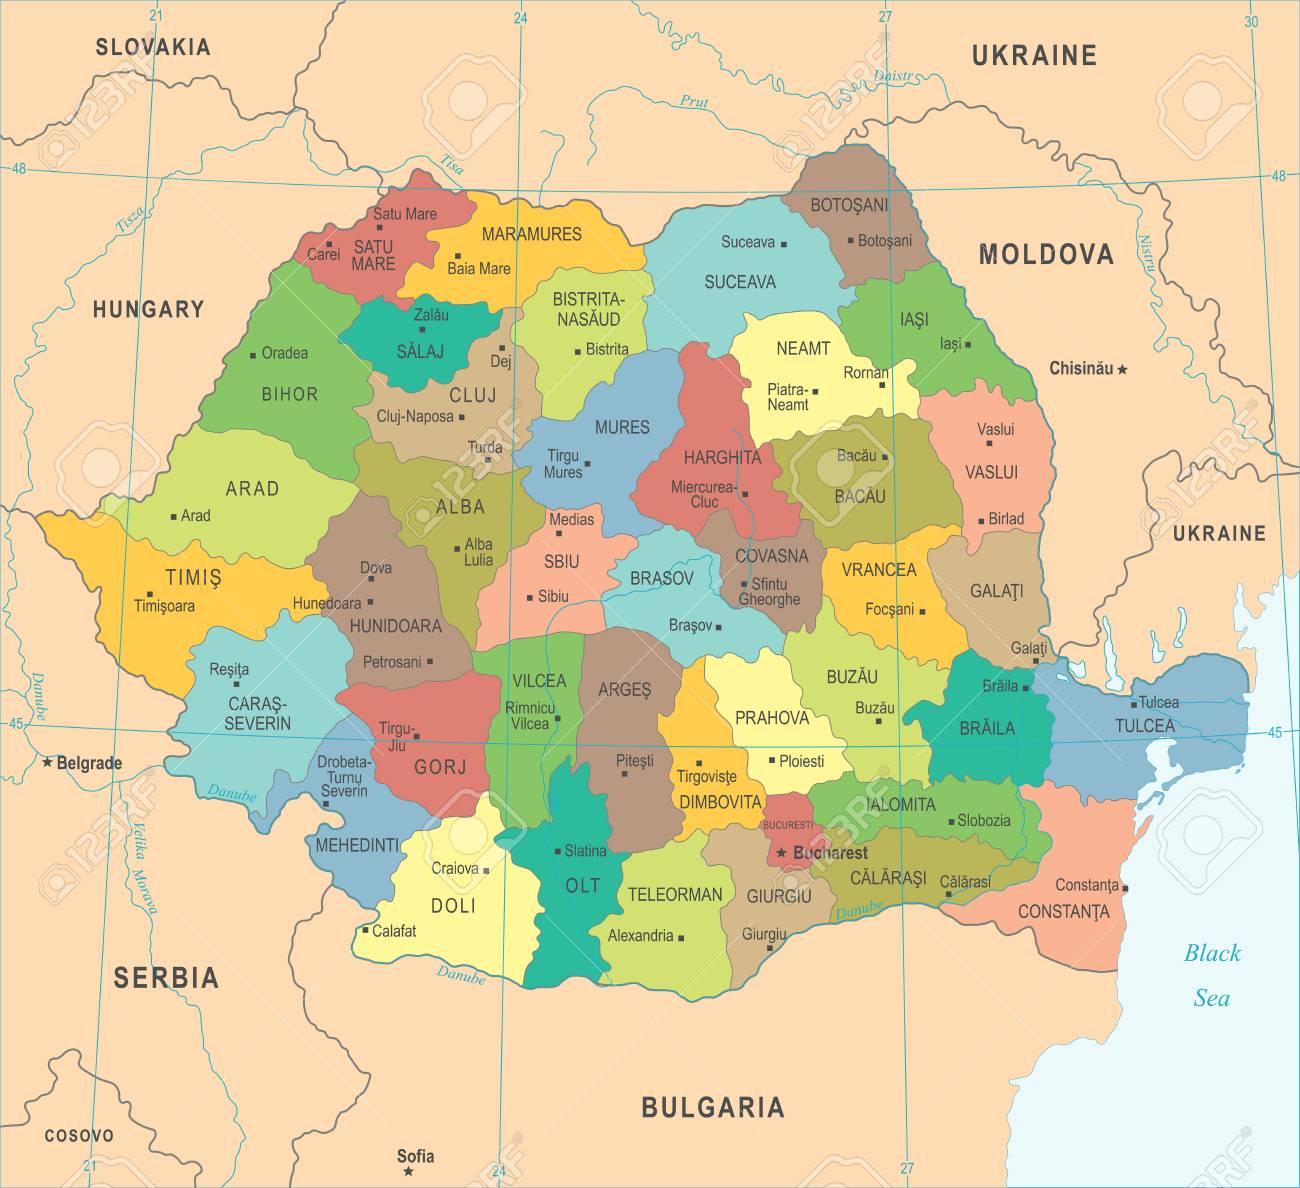 Rumanien Karte Hohe Detaillierte Vektor Illustration Lizenzfrei